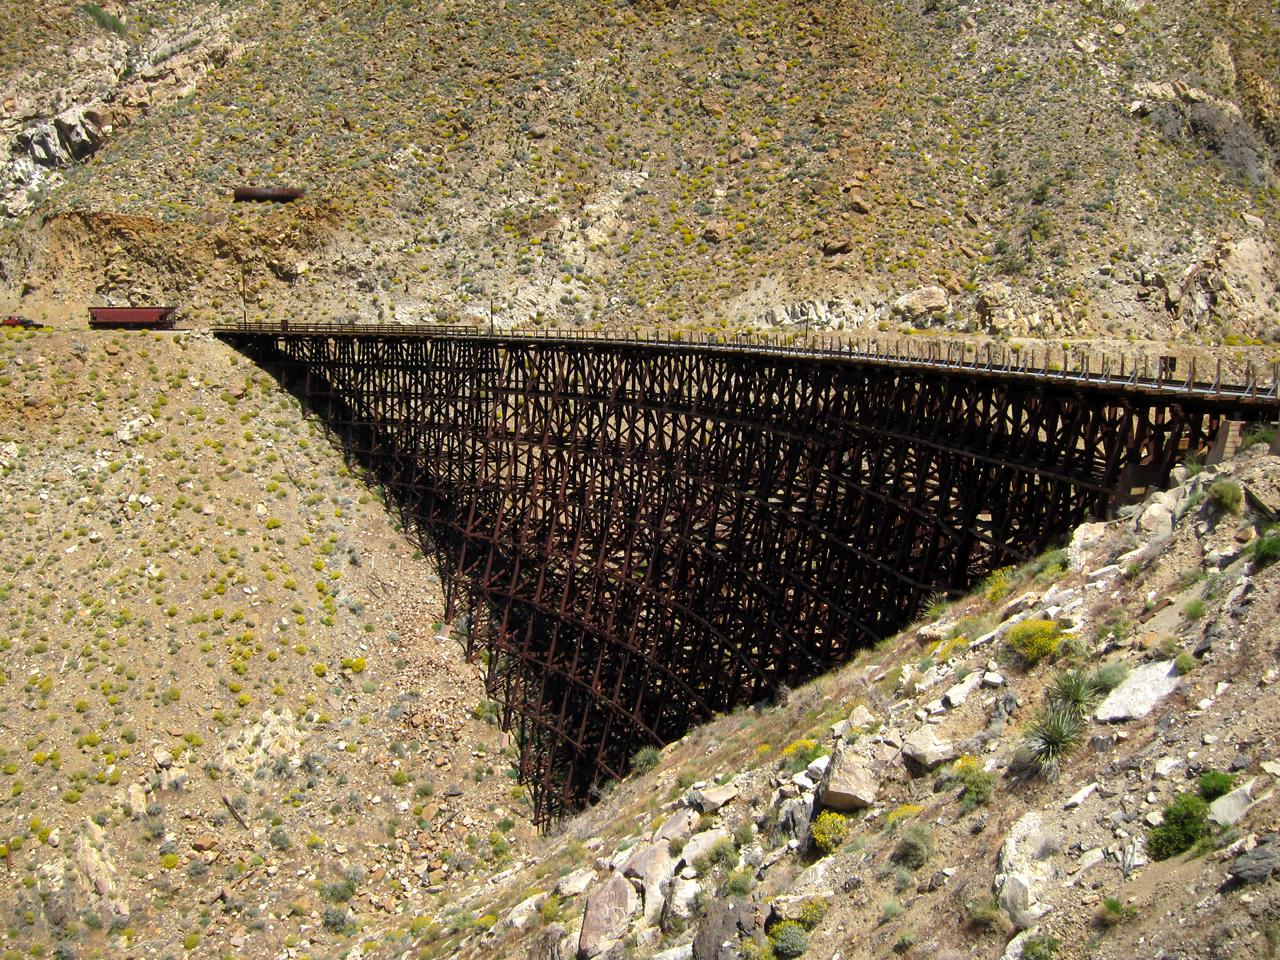 The spectacular Goat Canyon trestle deep in Carrizo Gorge - Anza Borrego